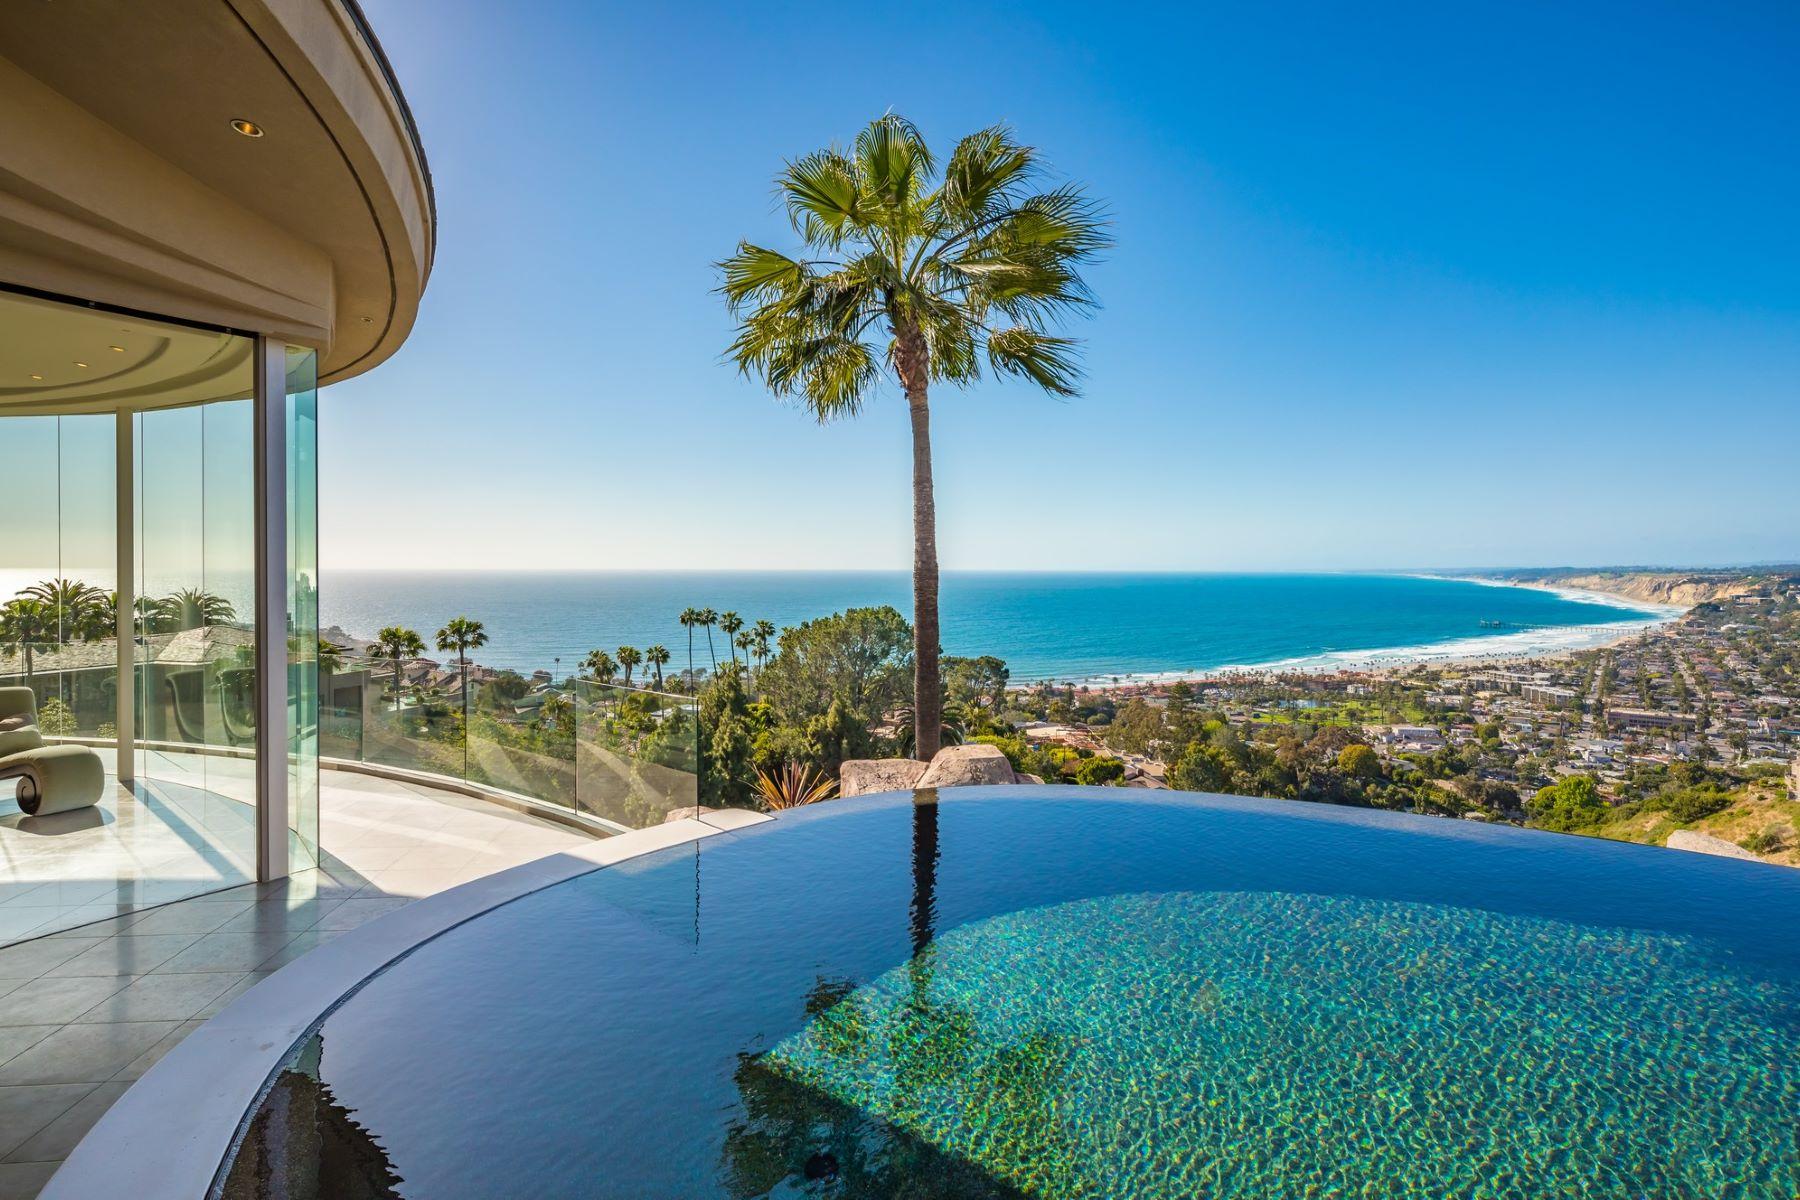 Single Family Home for Active at 7455 Hillside Drive La Jolla, California 92037 United States